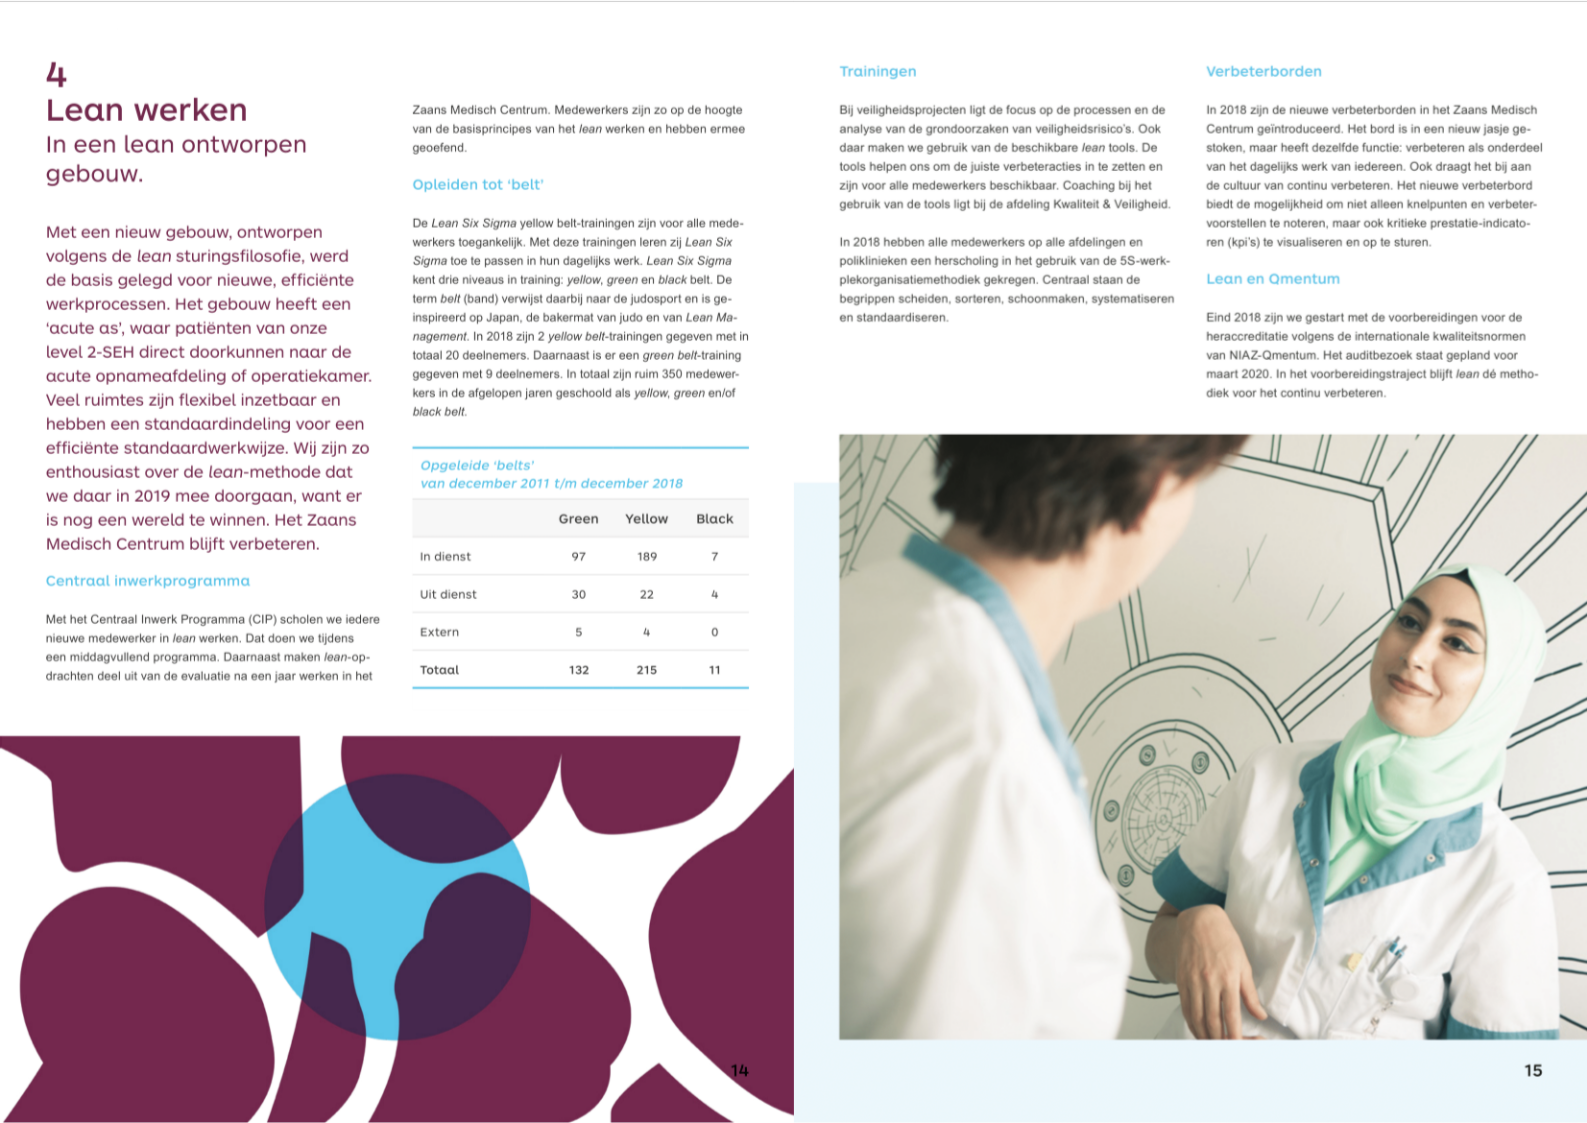 Vormgeving Jaarverslag Zaans Medisch Centrum - Zuurstof Amsterdam